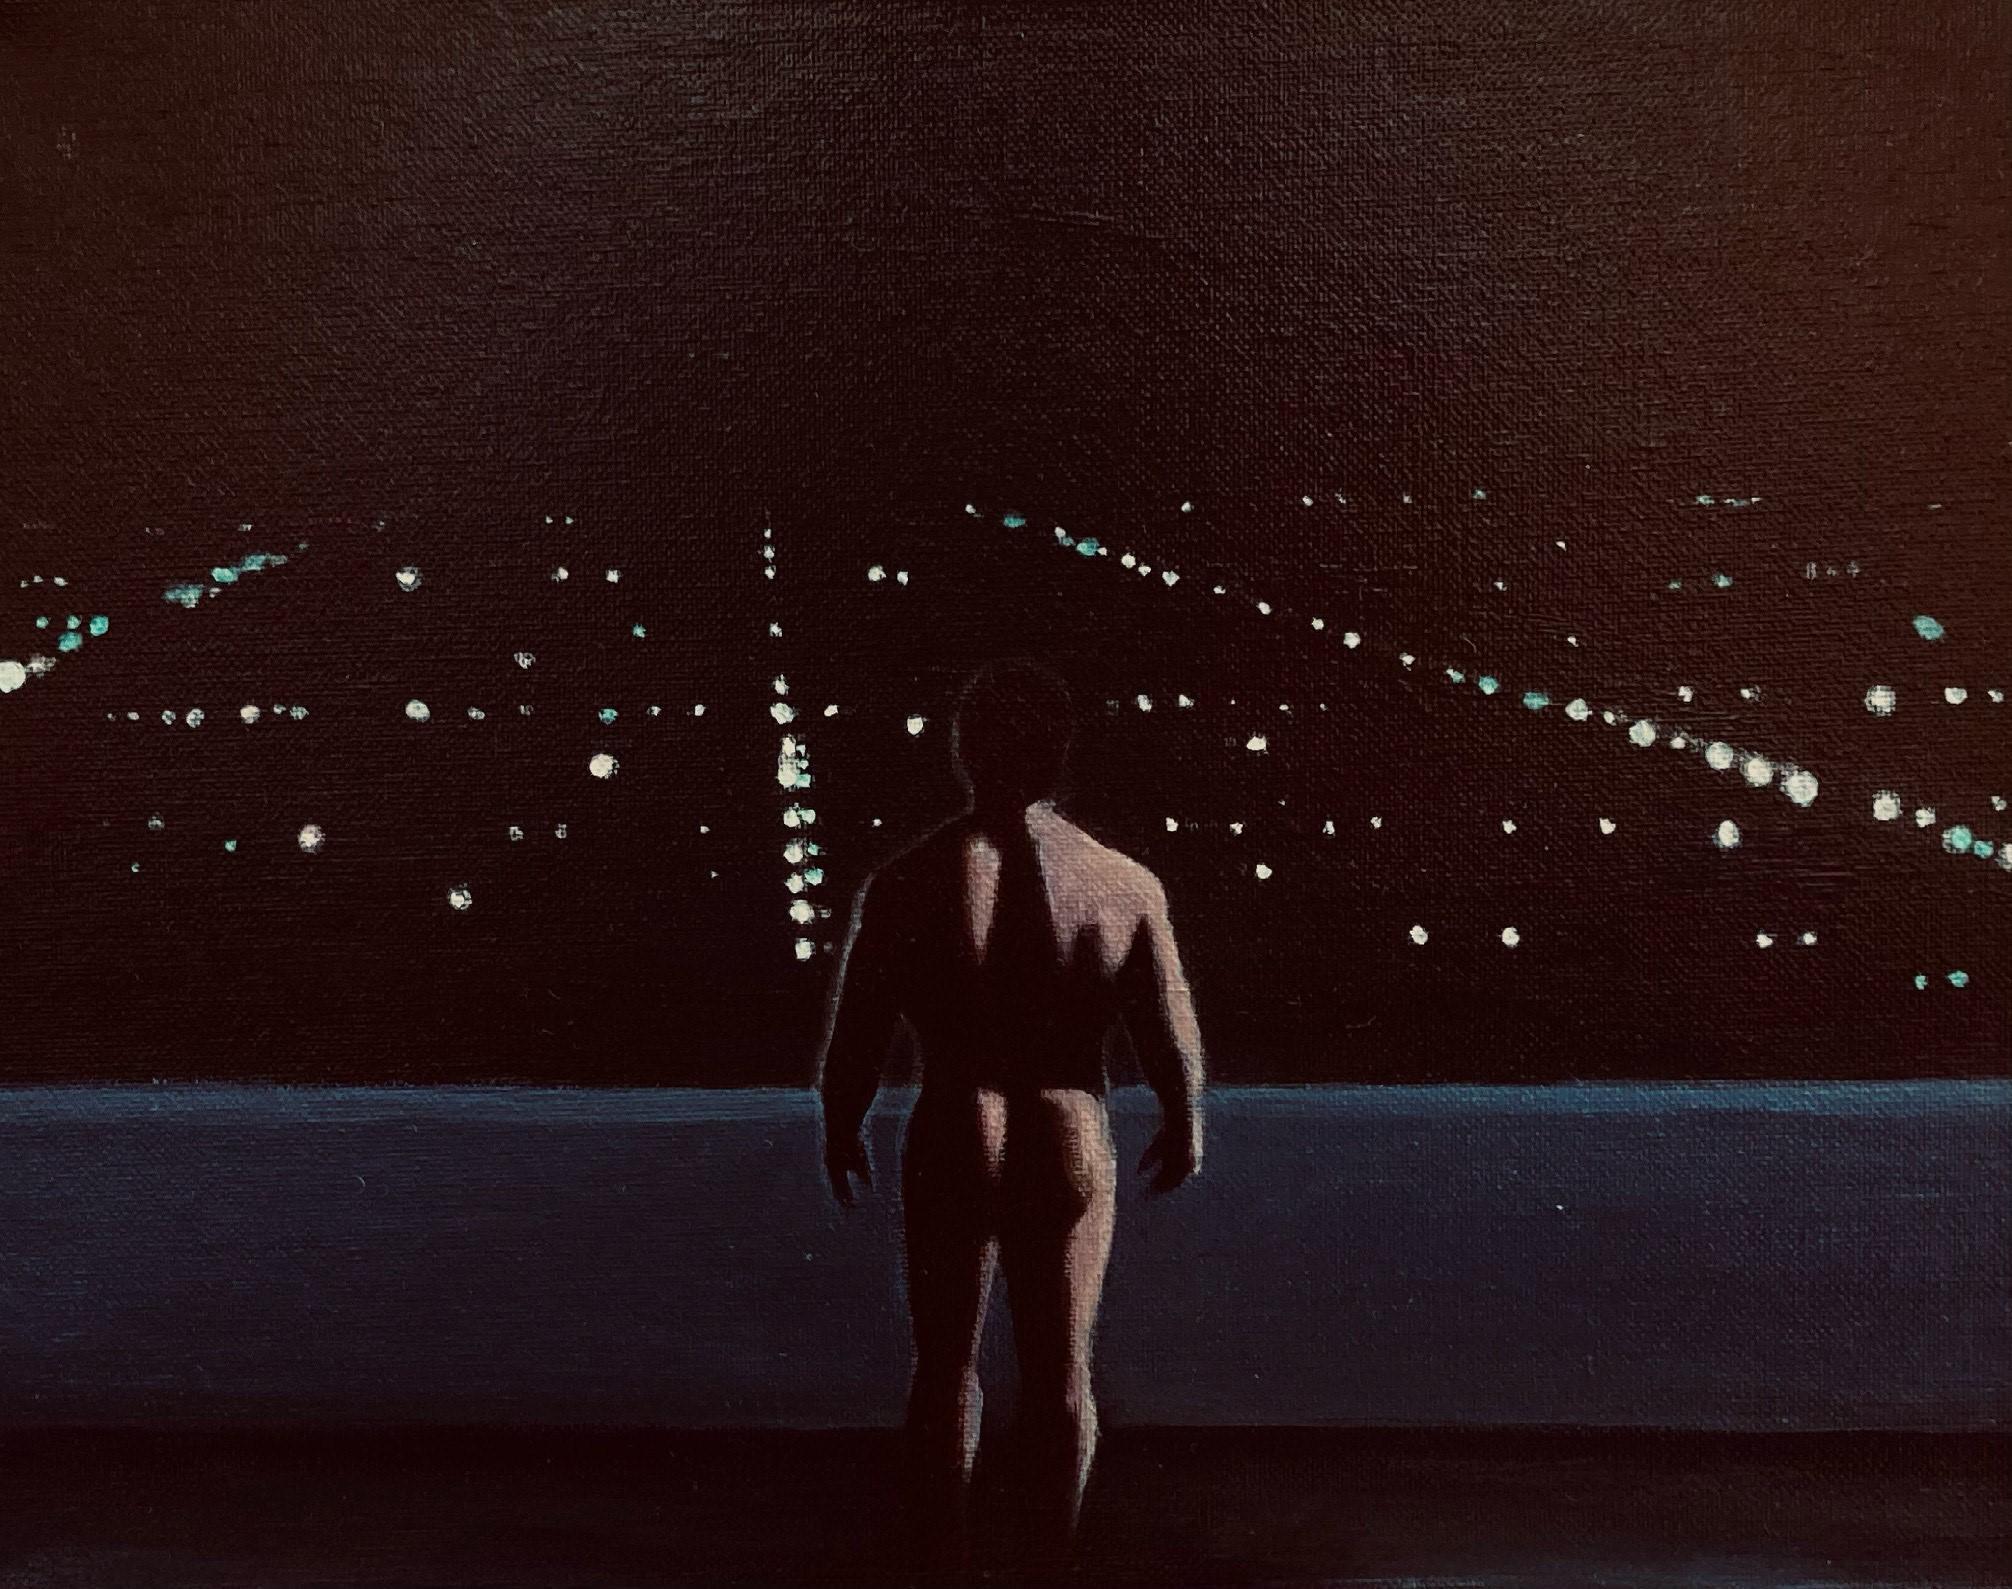 L.A. Nights (The Terminator)